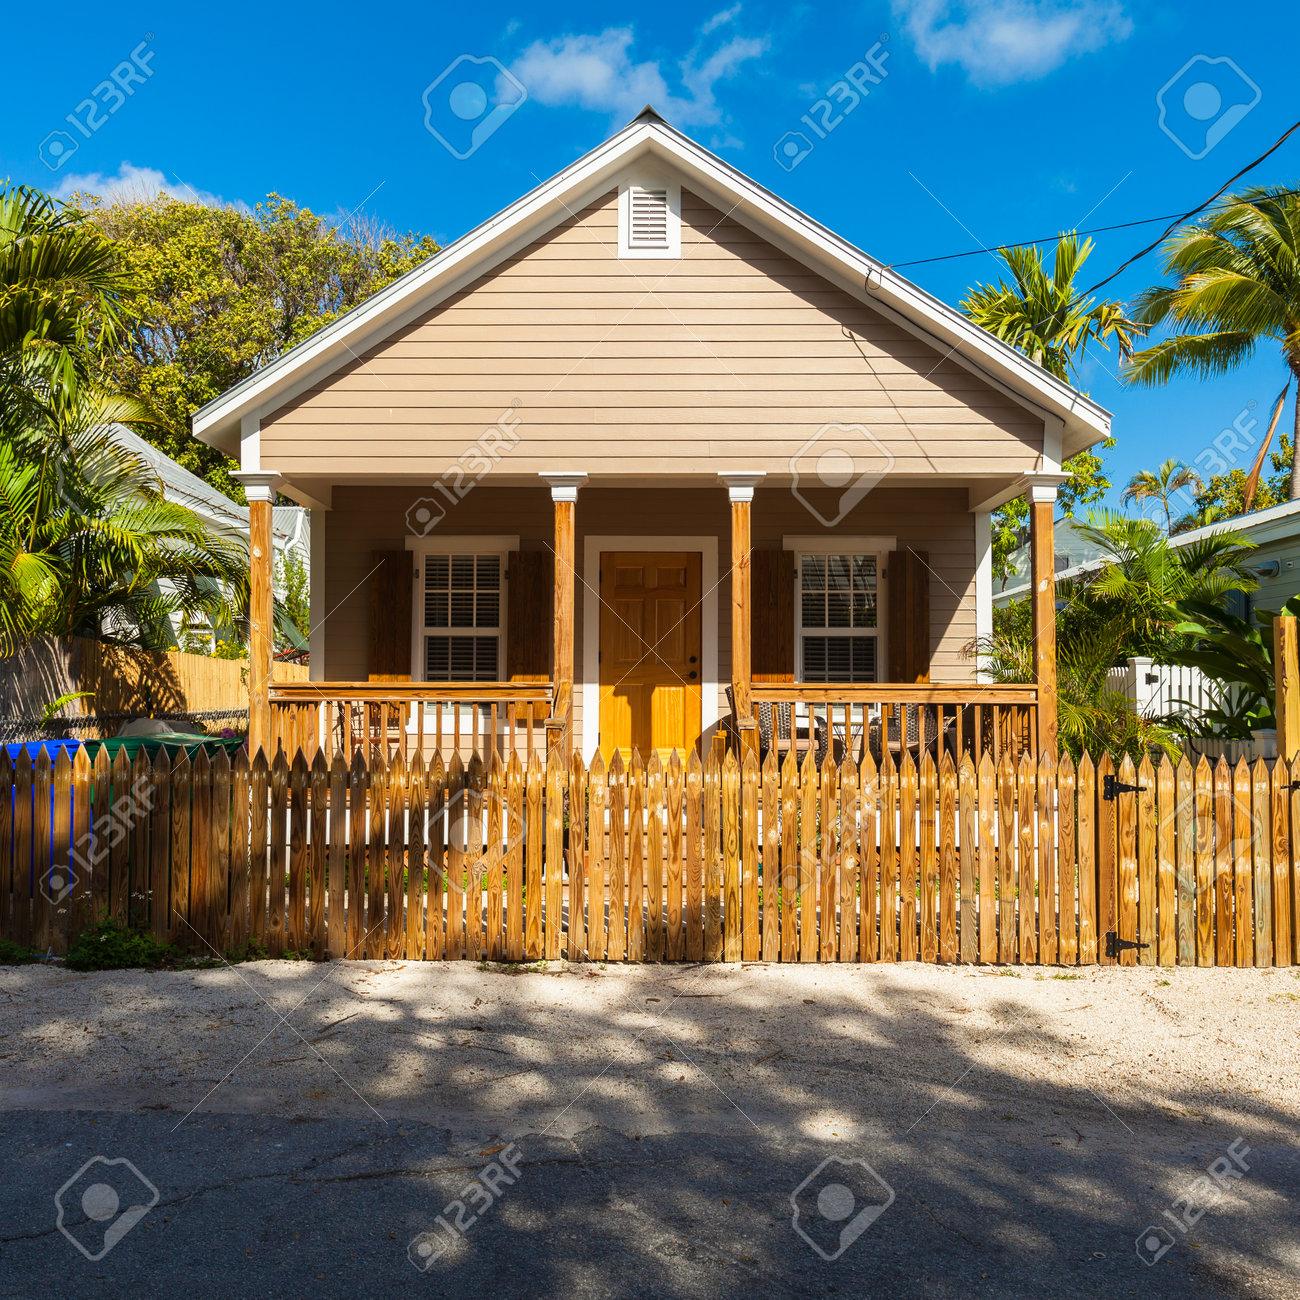 Key West Florida Usa 3 Marz 2015 Typische Holz Rahmen